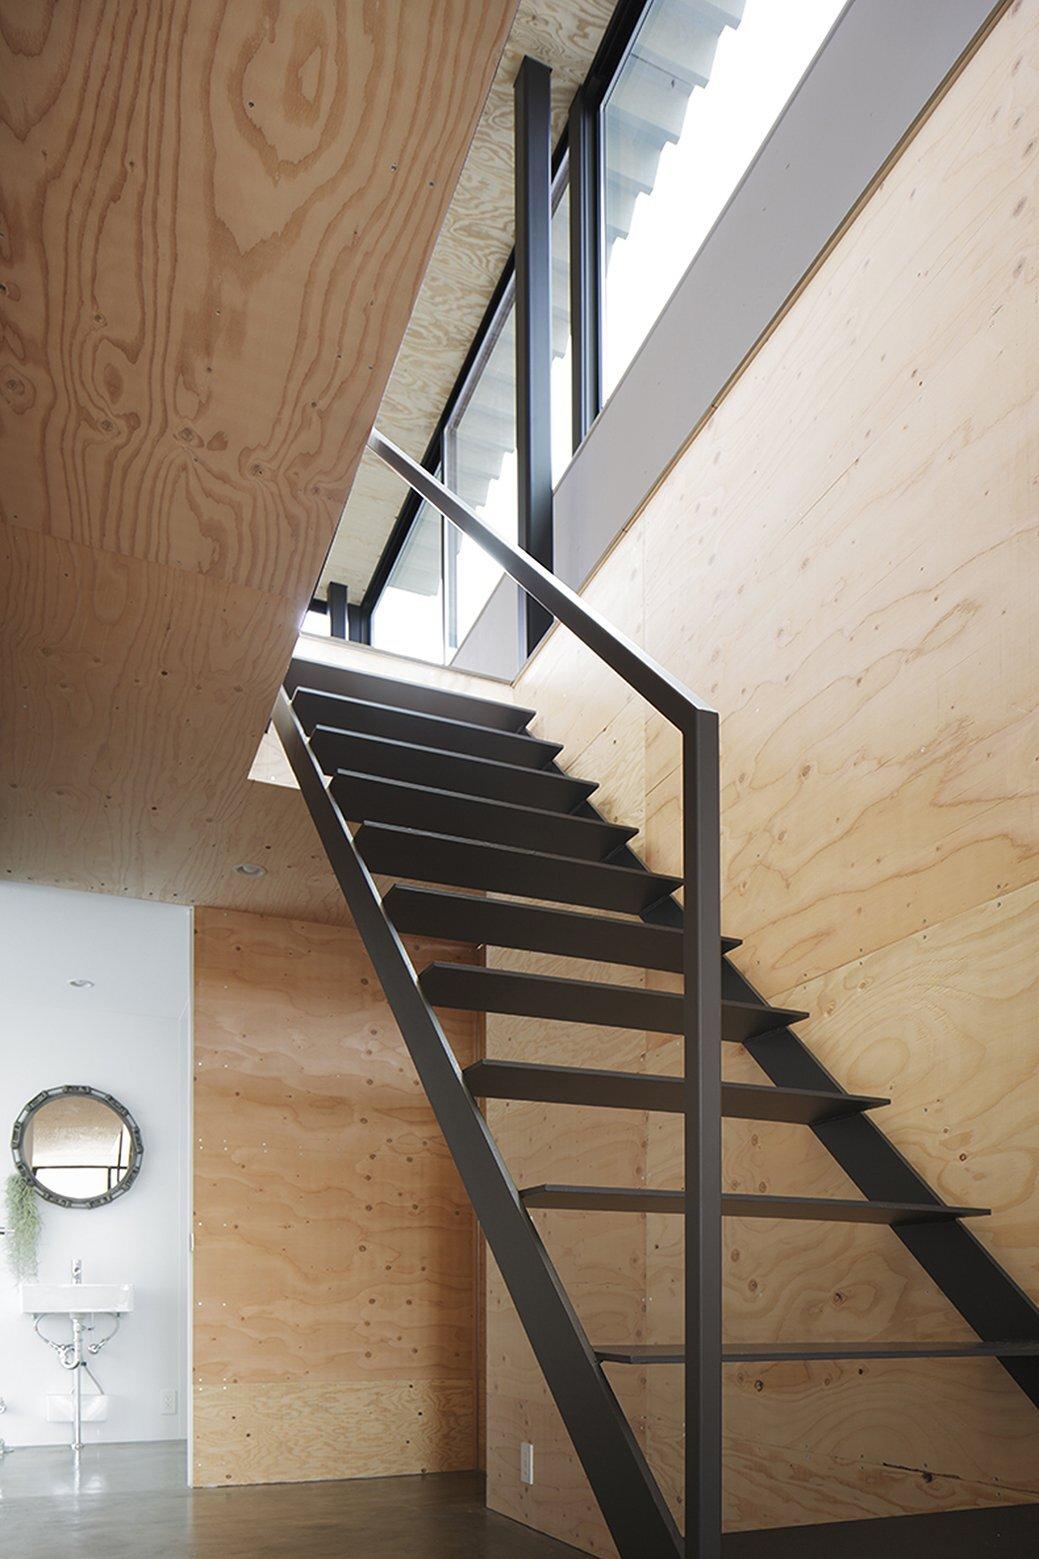 House in Miyake - Japanese House - Hidetaka Nakahara Architects - Yoshio Ohno Architects - Hiroshima Japan - Staircase - Humble Homes